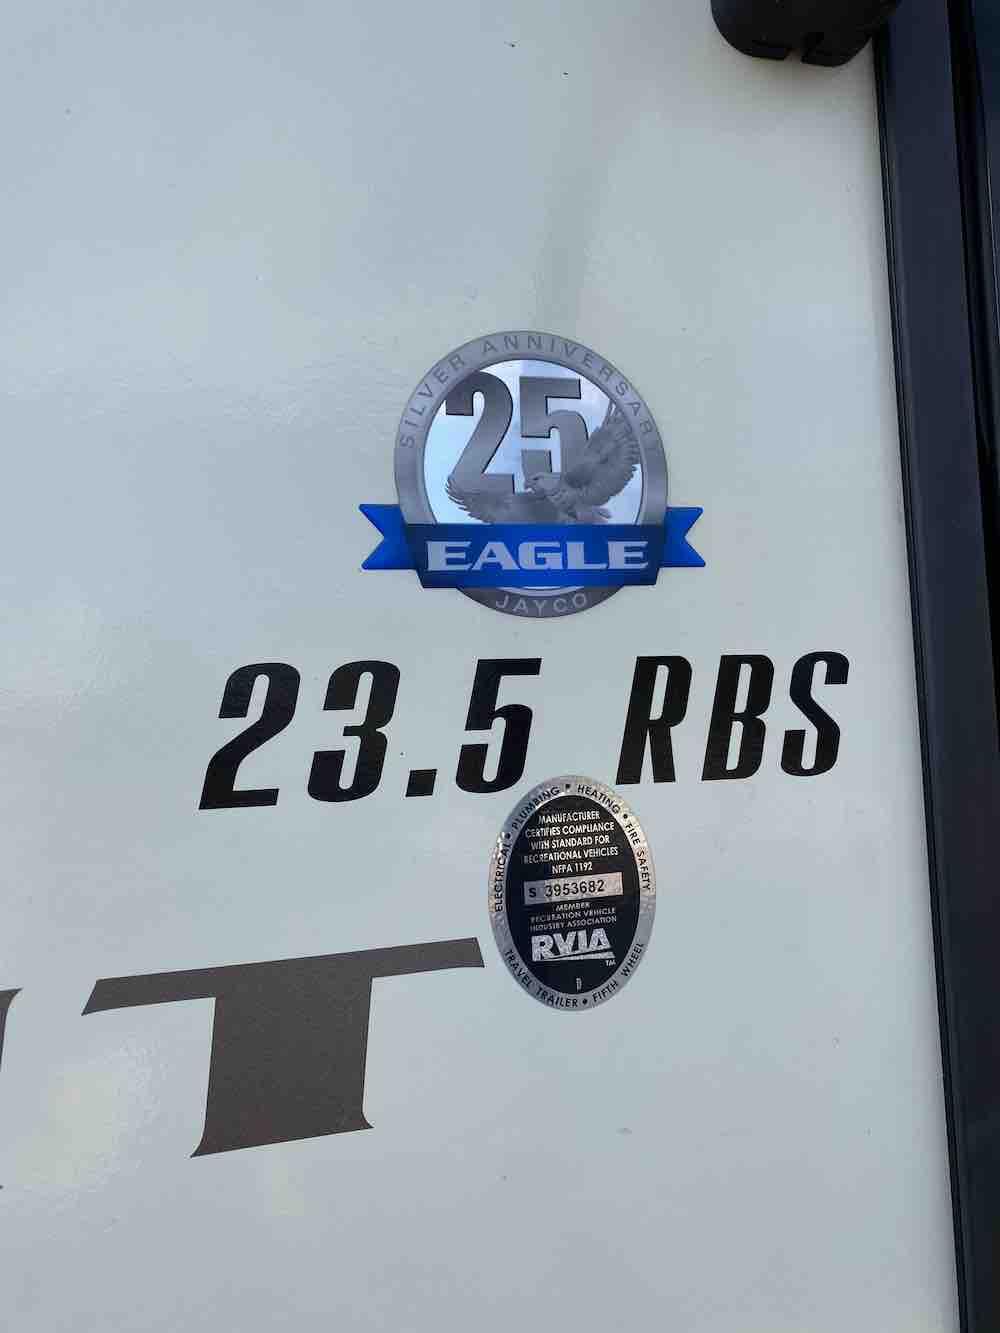 2016 JAYCO EAGLE 23.5 RBS full